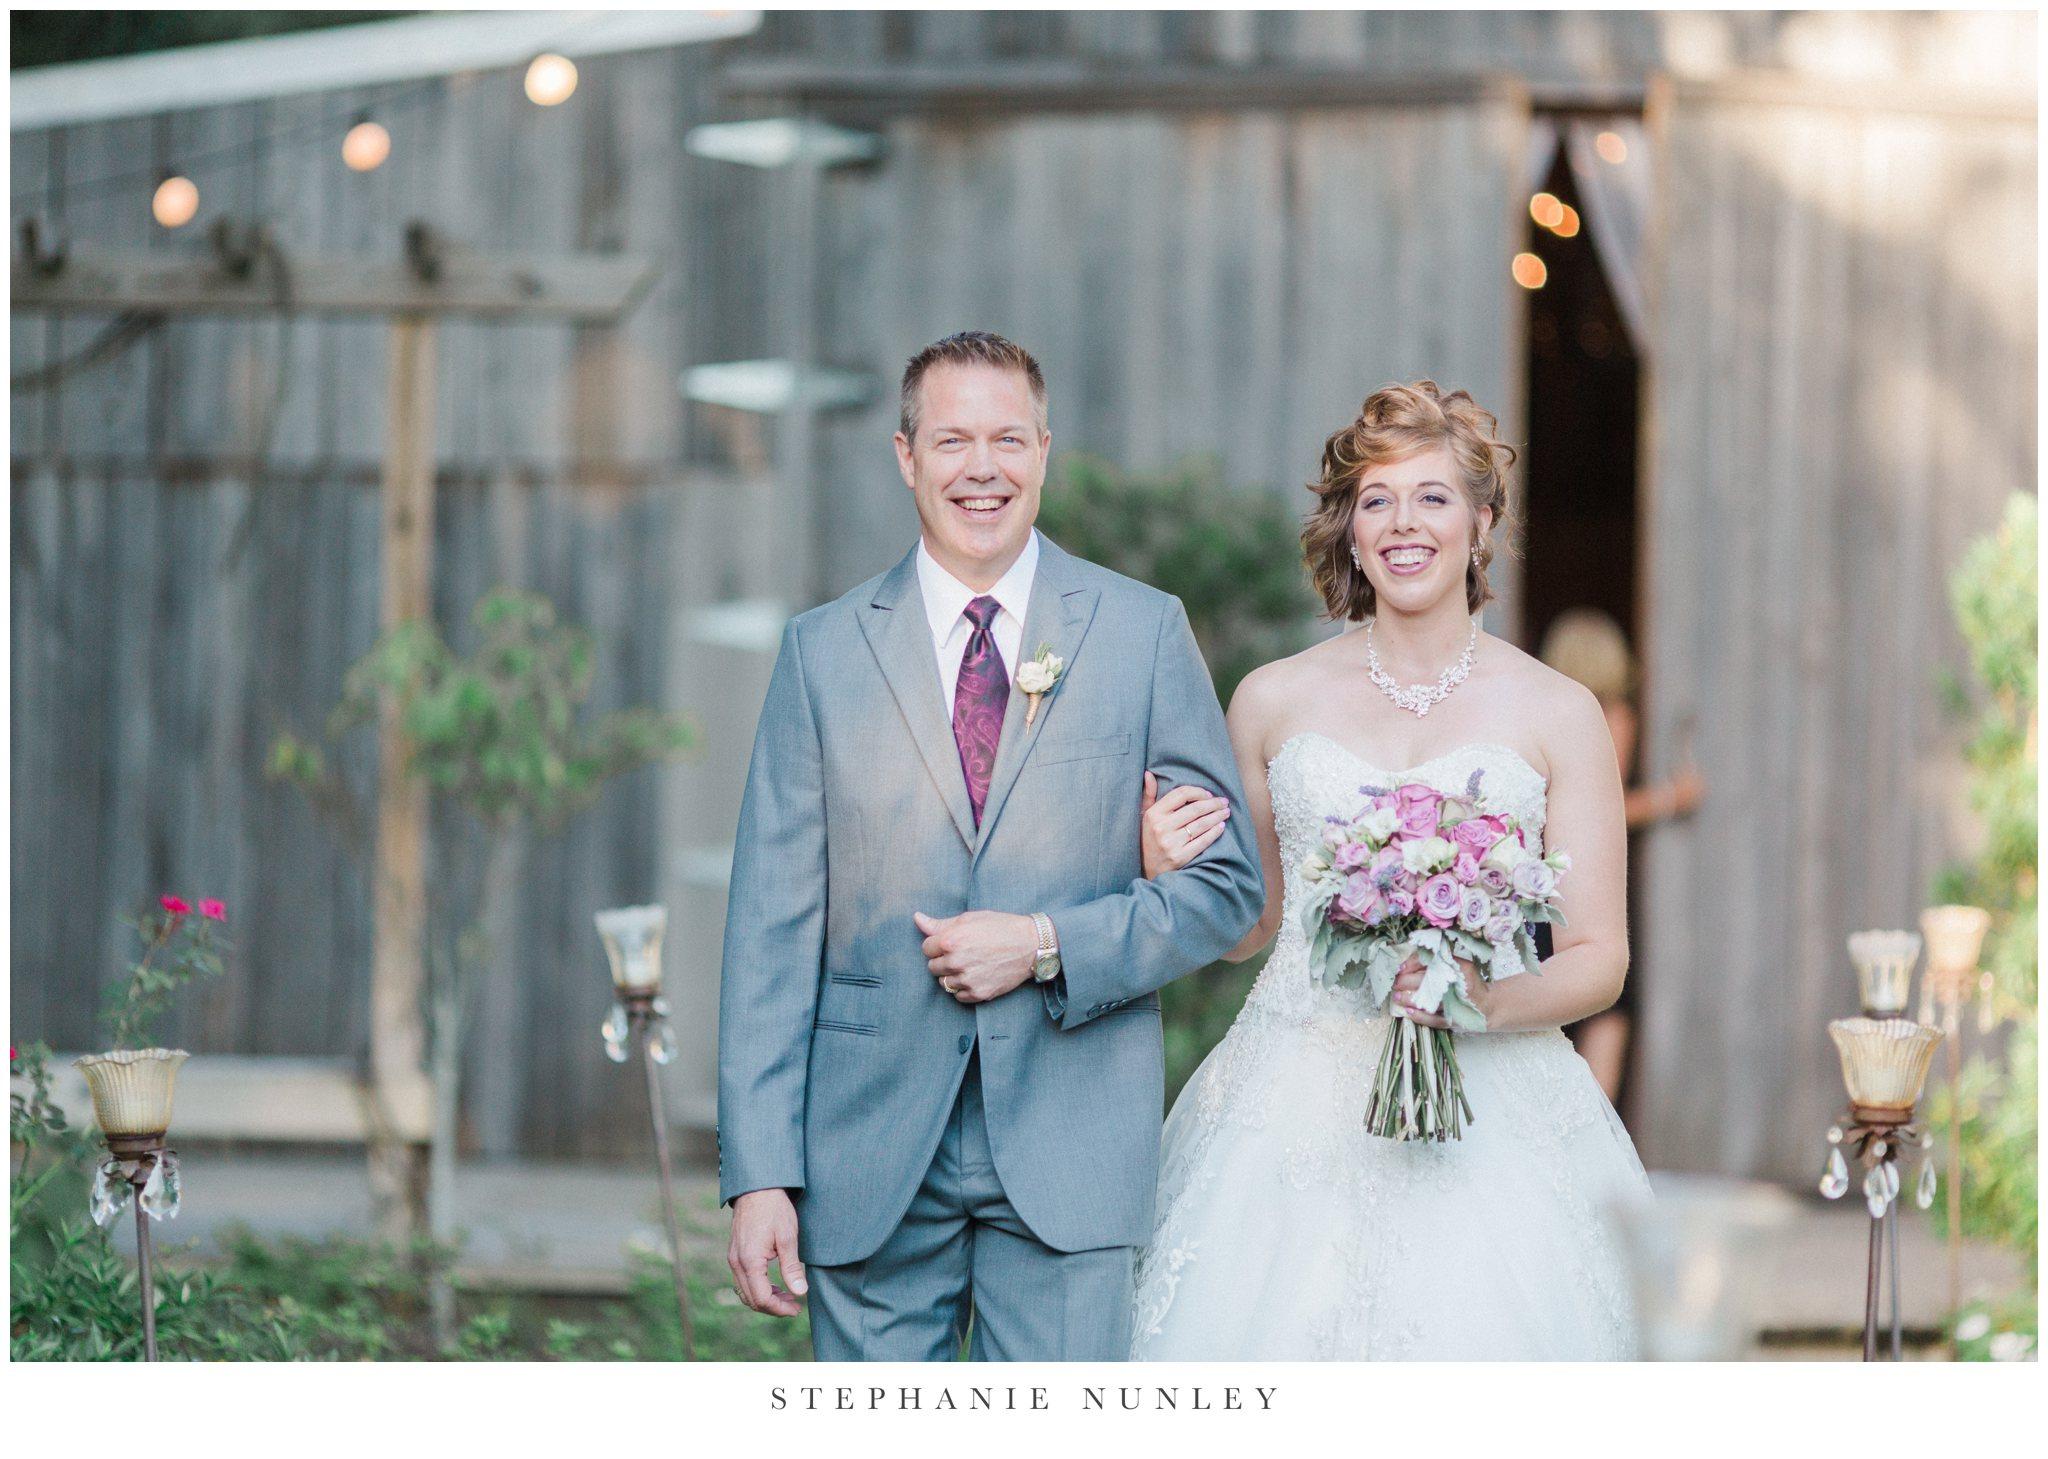 southern-classy-outdoor-barn-wedding-photos-0075.jpg